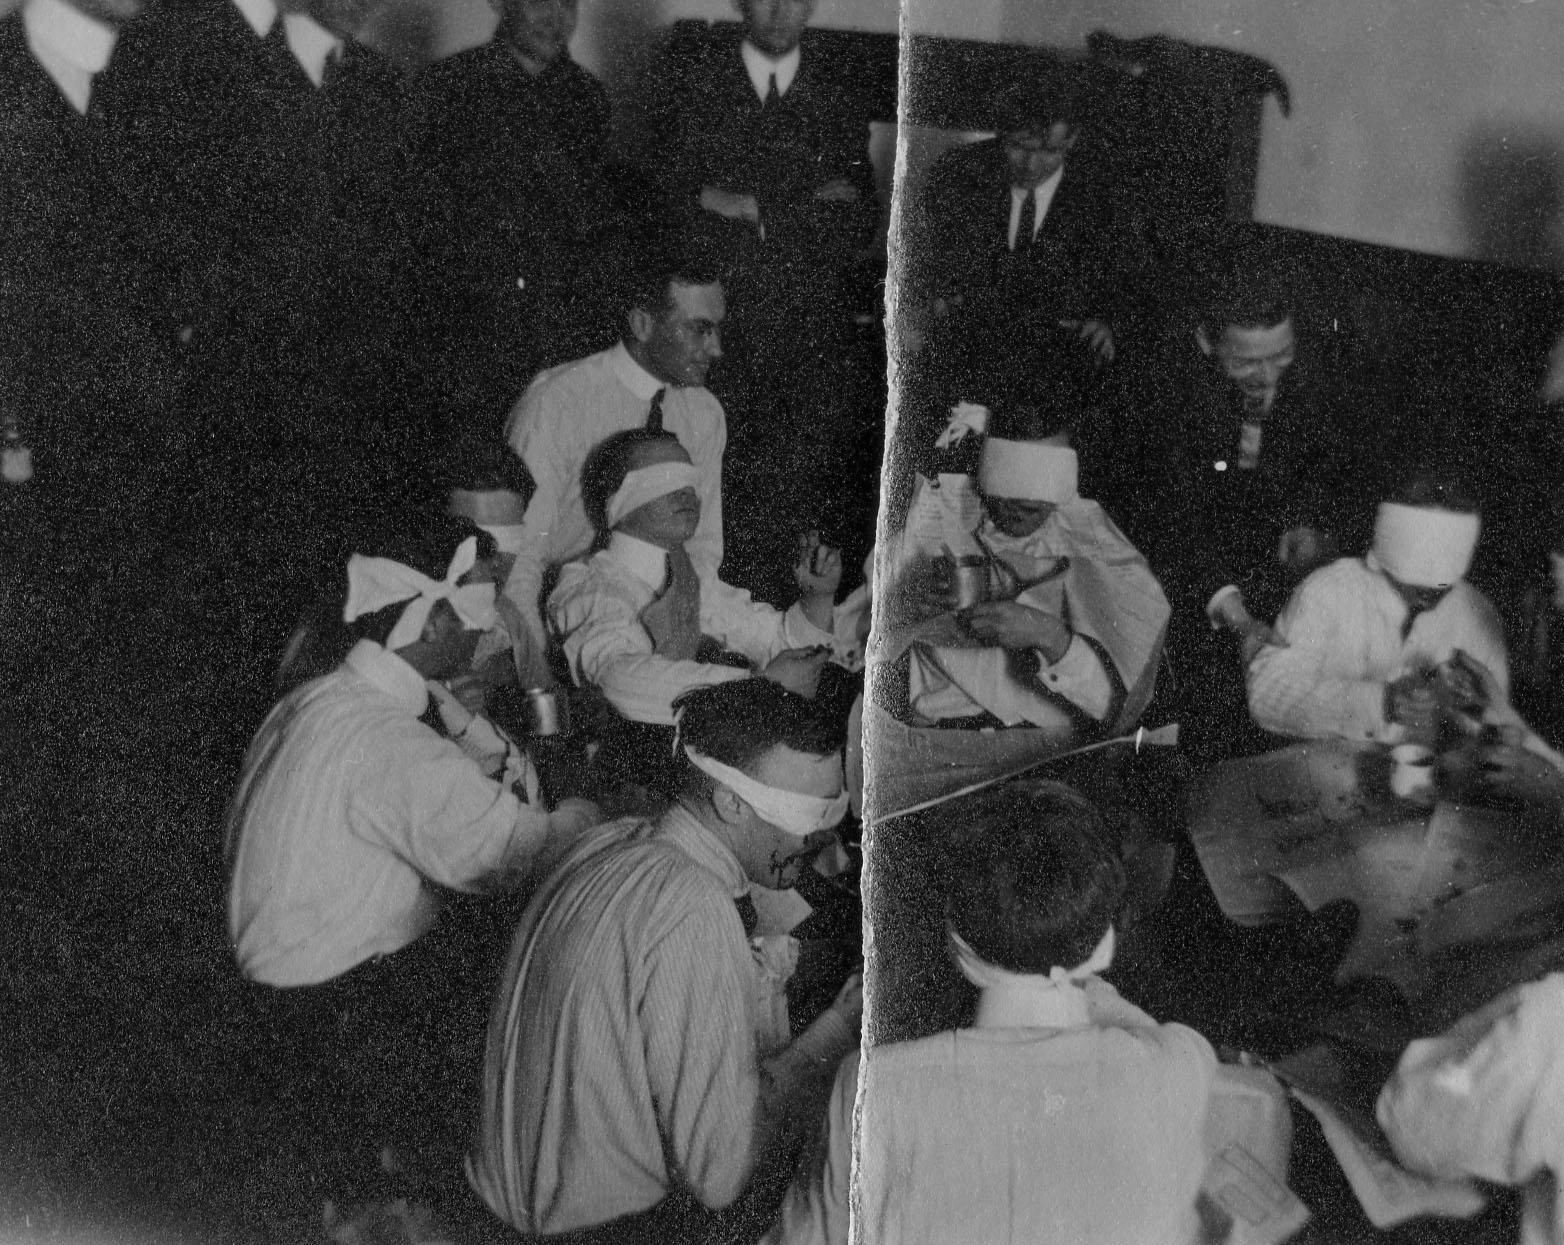 Men eating while blindfolded, c. 1911-1914